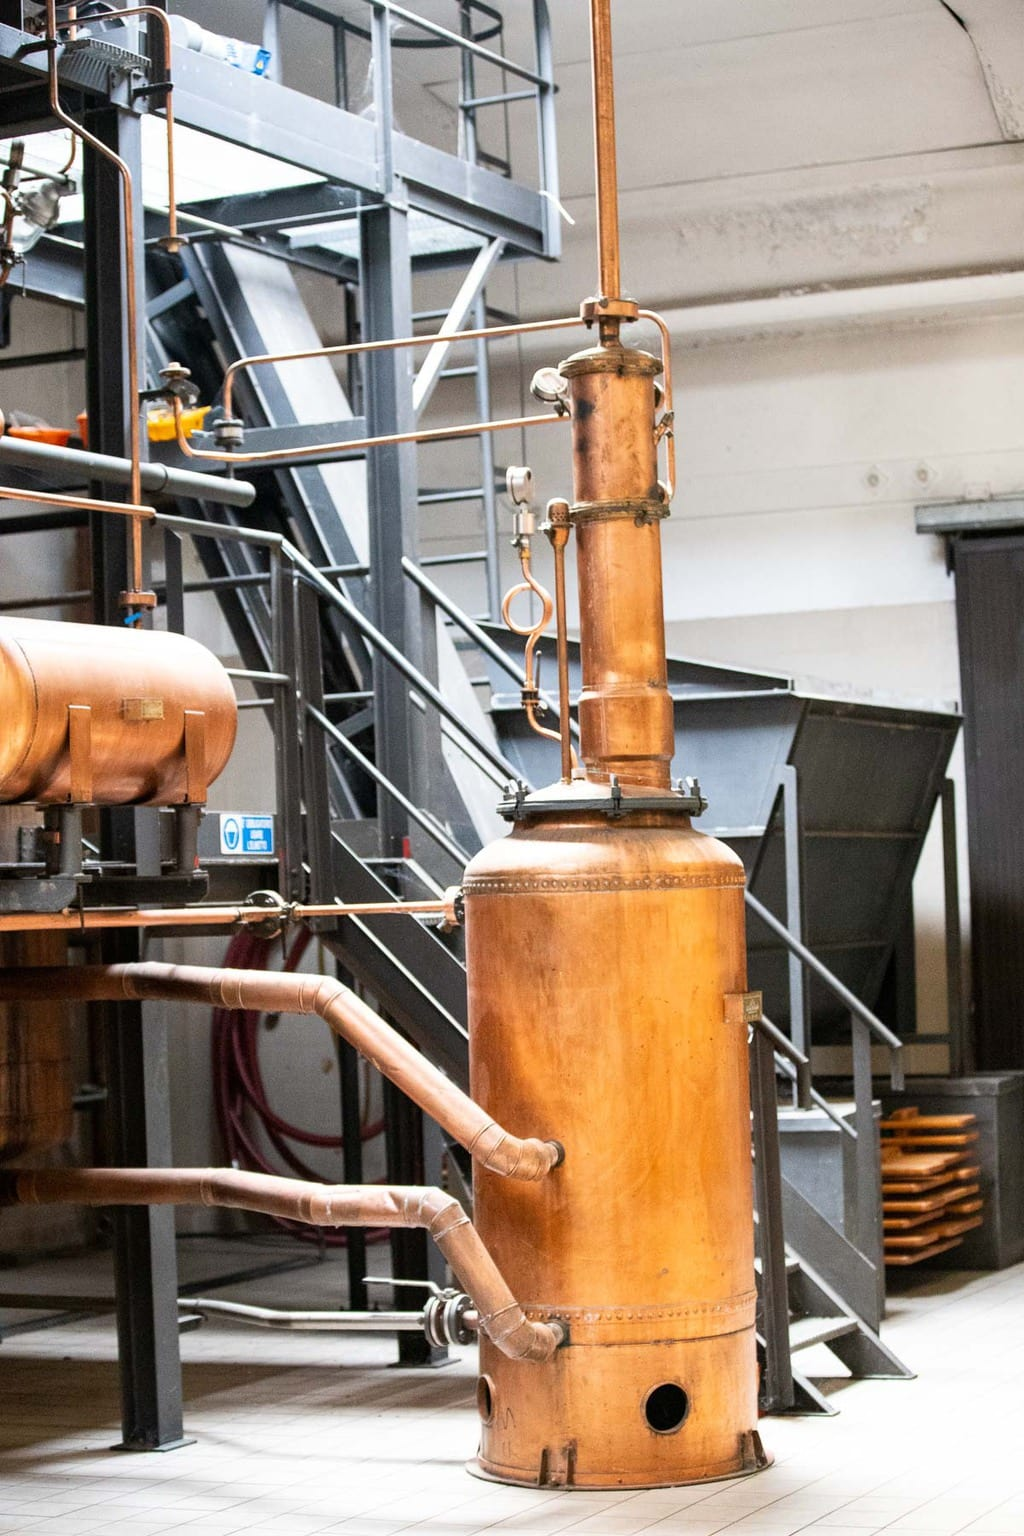 Vertical photo of a Grappa liquor factory equipment.